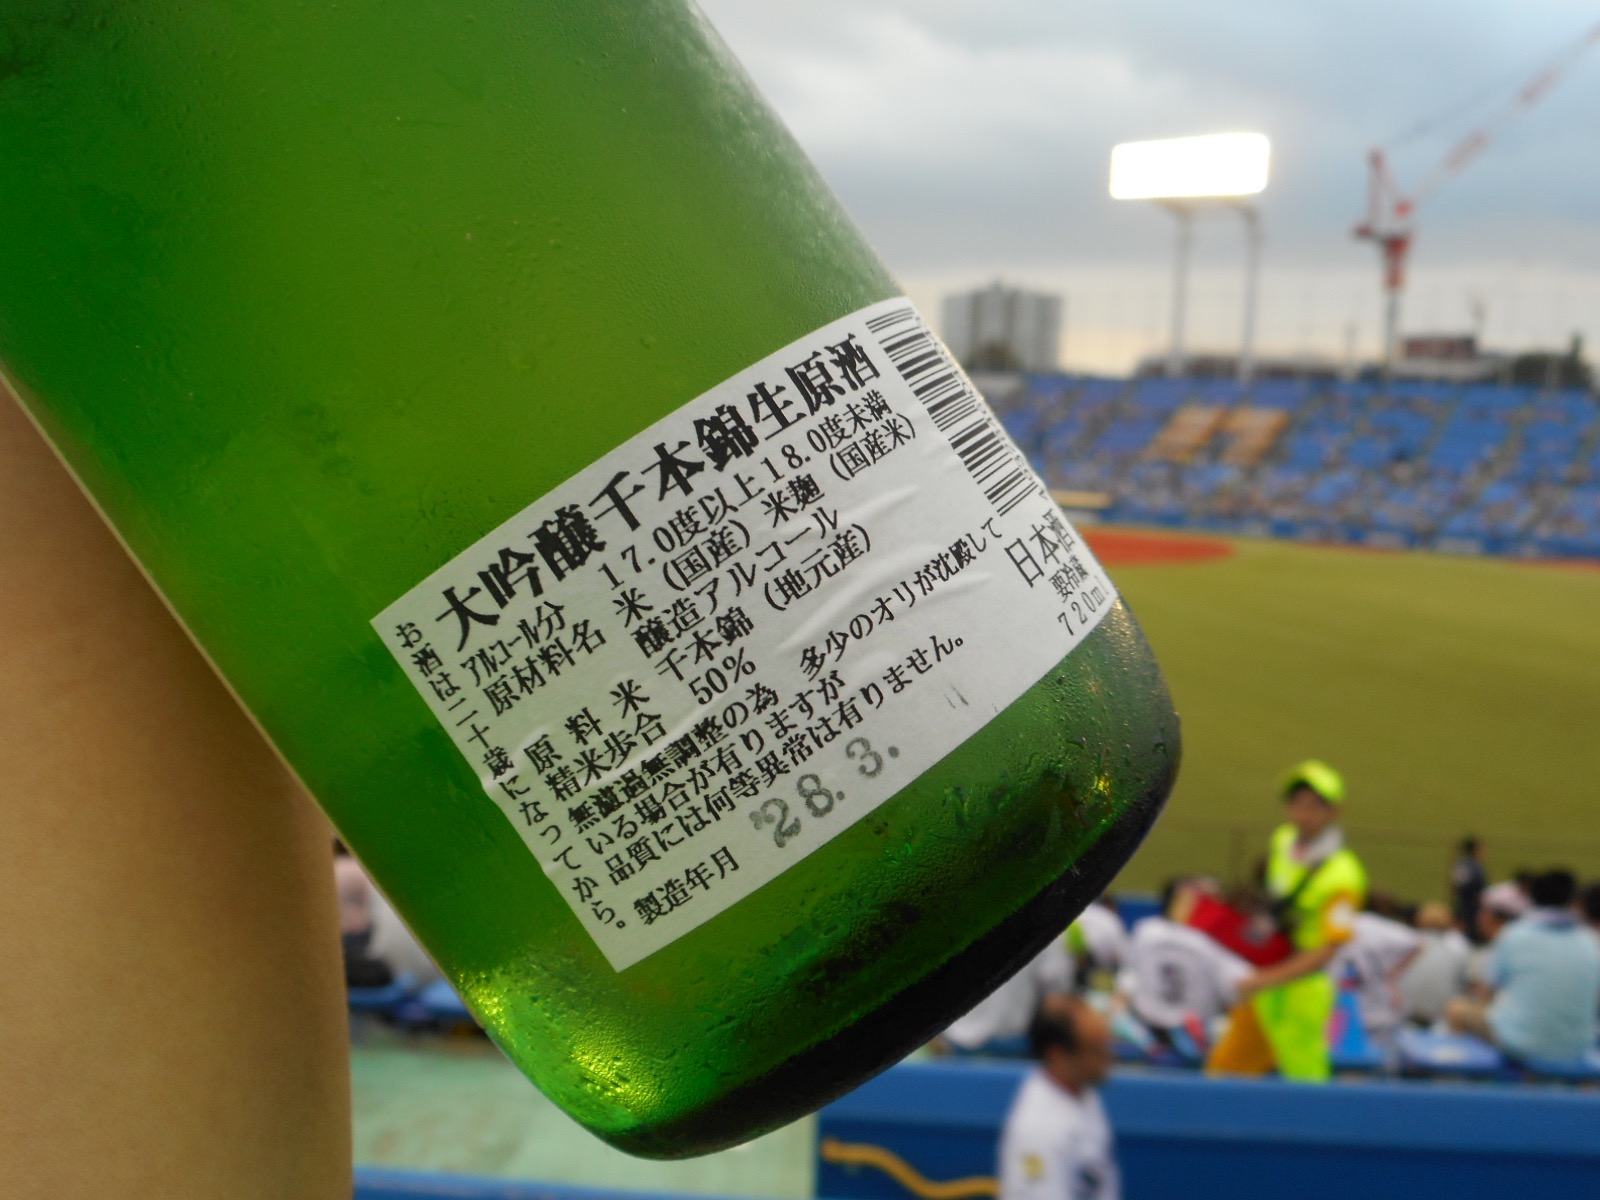 miwazakura_senbon_daiginjo_nama3.jpg